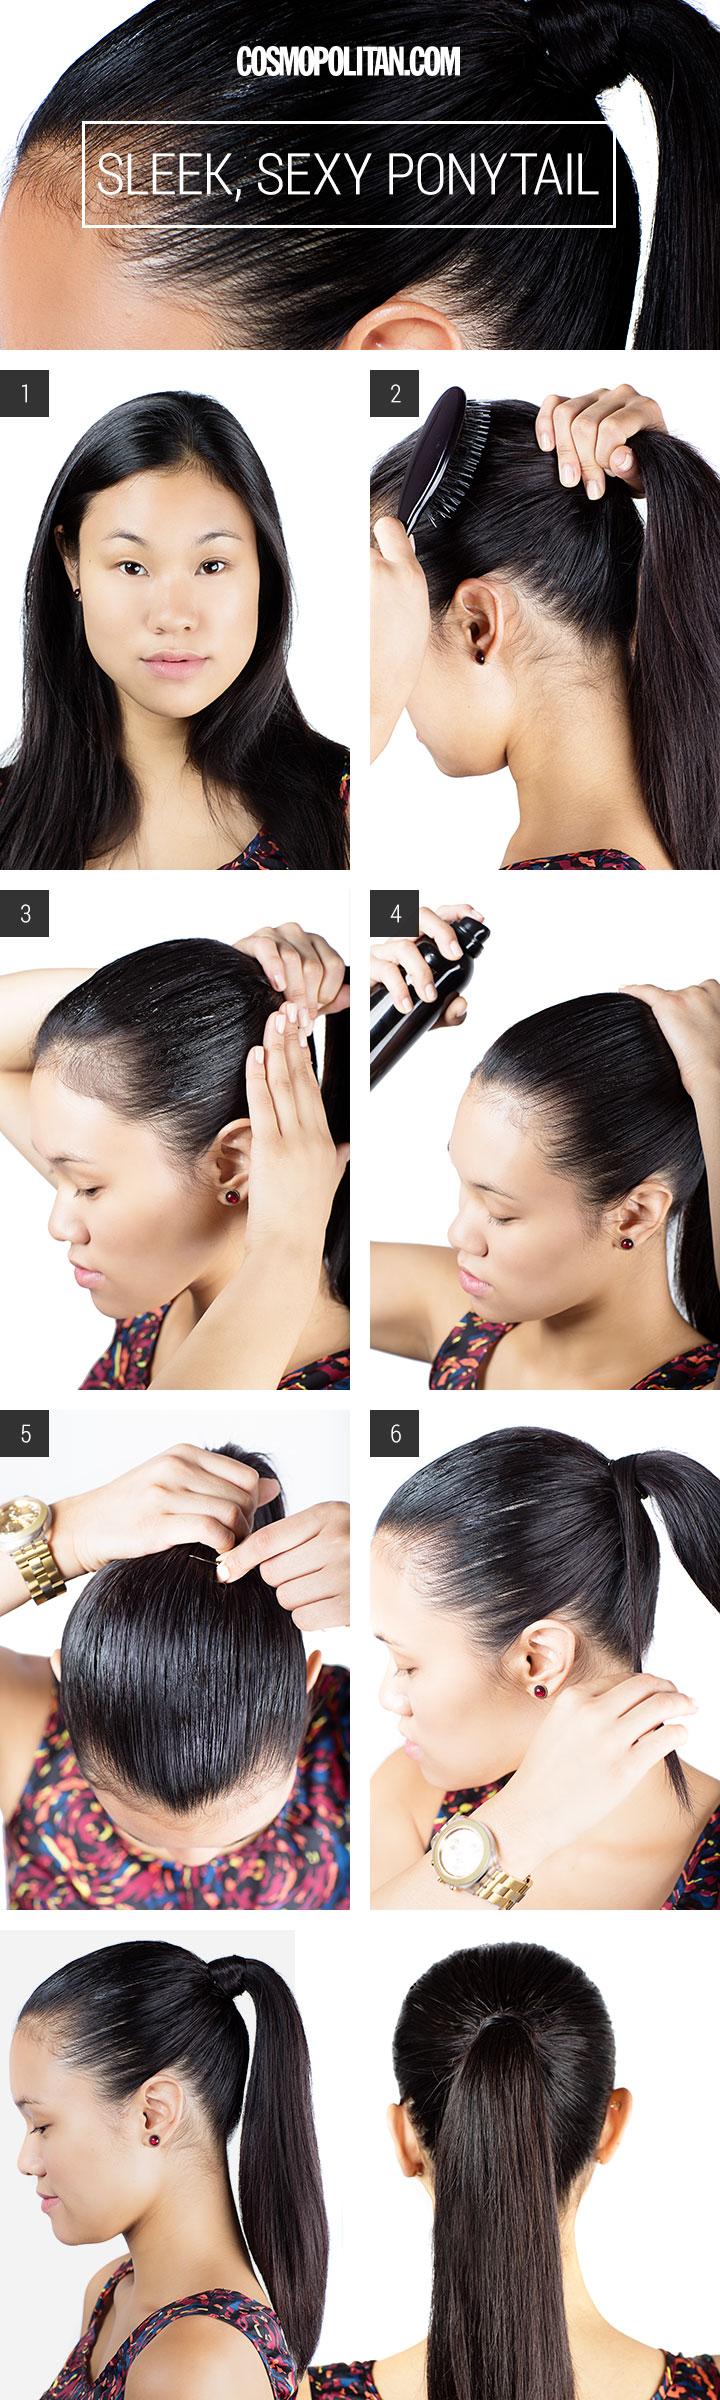 sleek sexy ponytail